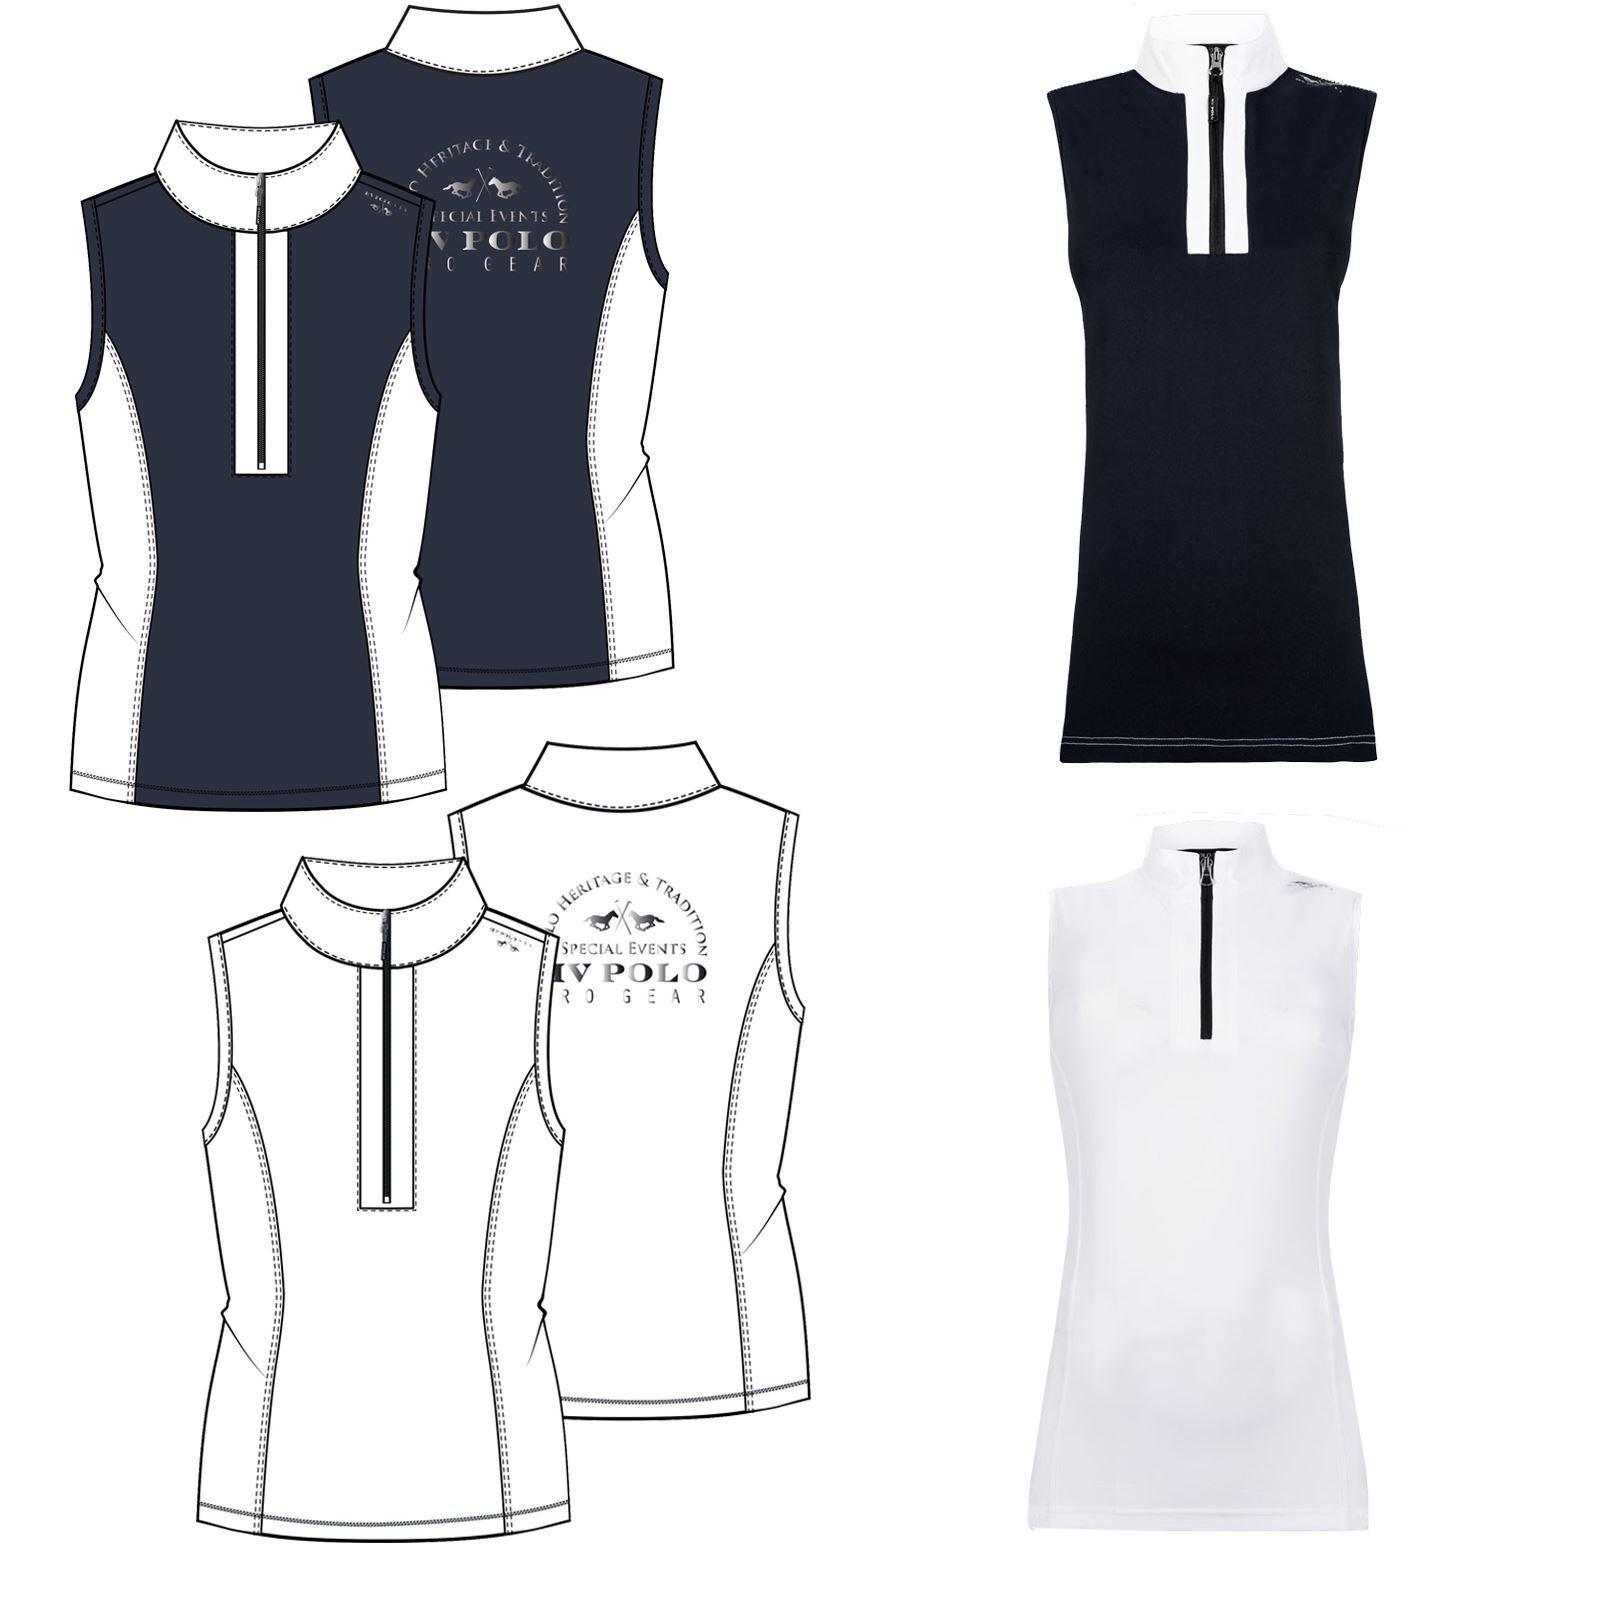 HV Polo Noah Womens Sleeveless High Collar Horse Riding Competition Shirt Top